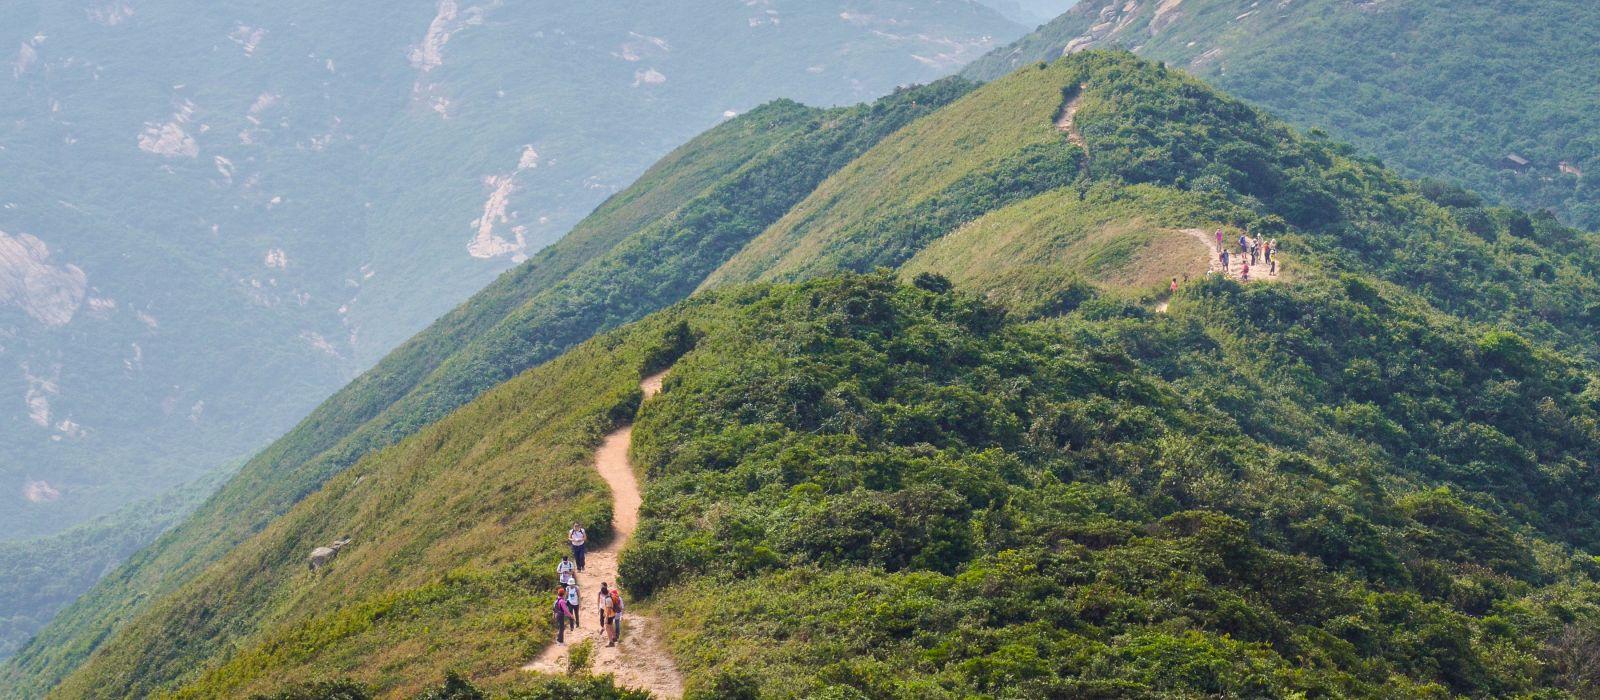 Hongkong Wanderwegkulisse - Dragon's Back, Asien